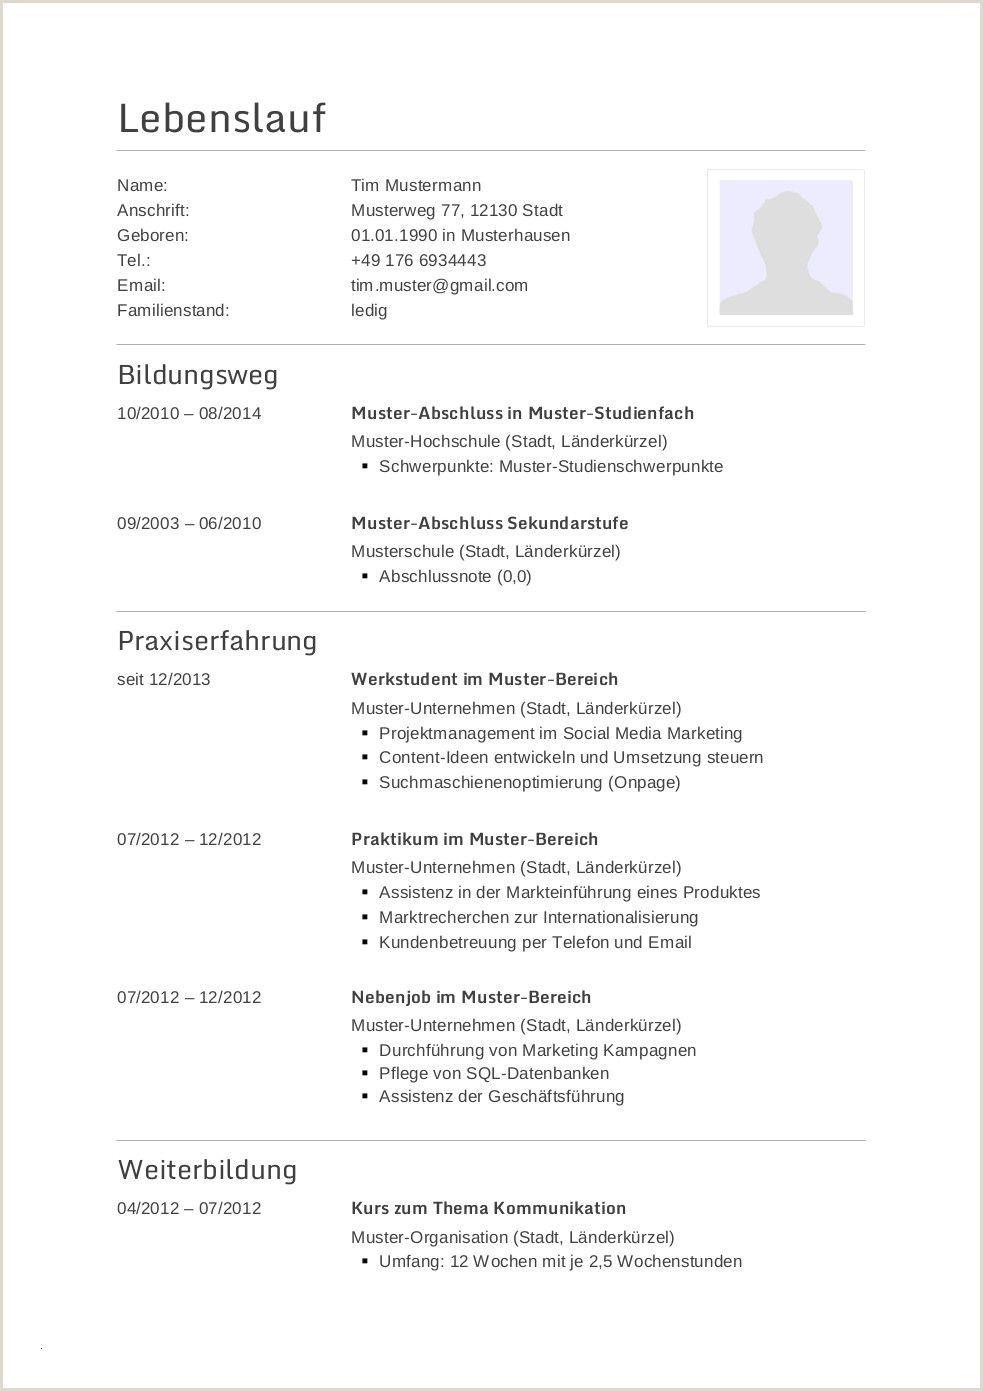 Lebenslauf Muster Referendariat Lehramt Resume Template Free Downloadable Lebenslauf Muster Ref In 2020 Lebenslauf Vorlagen Lebenslauf Lebenslauf Bewerbung Muster